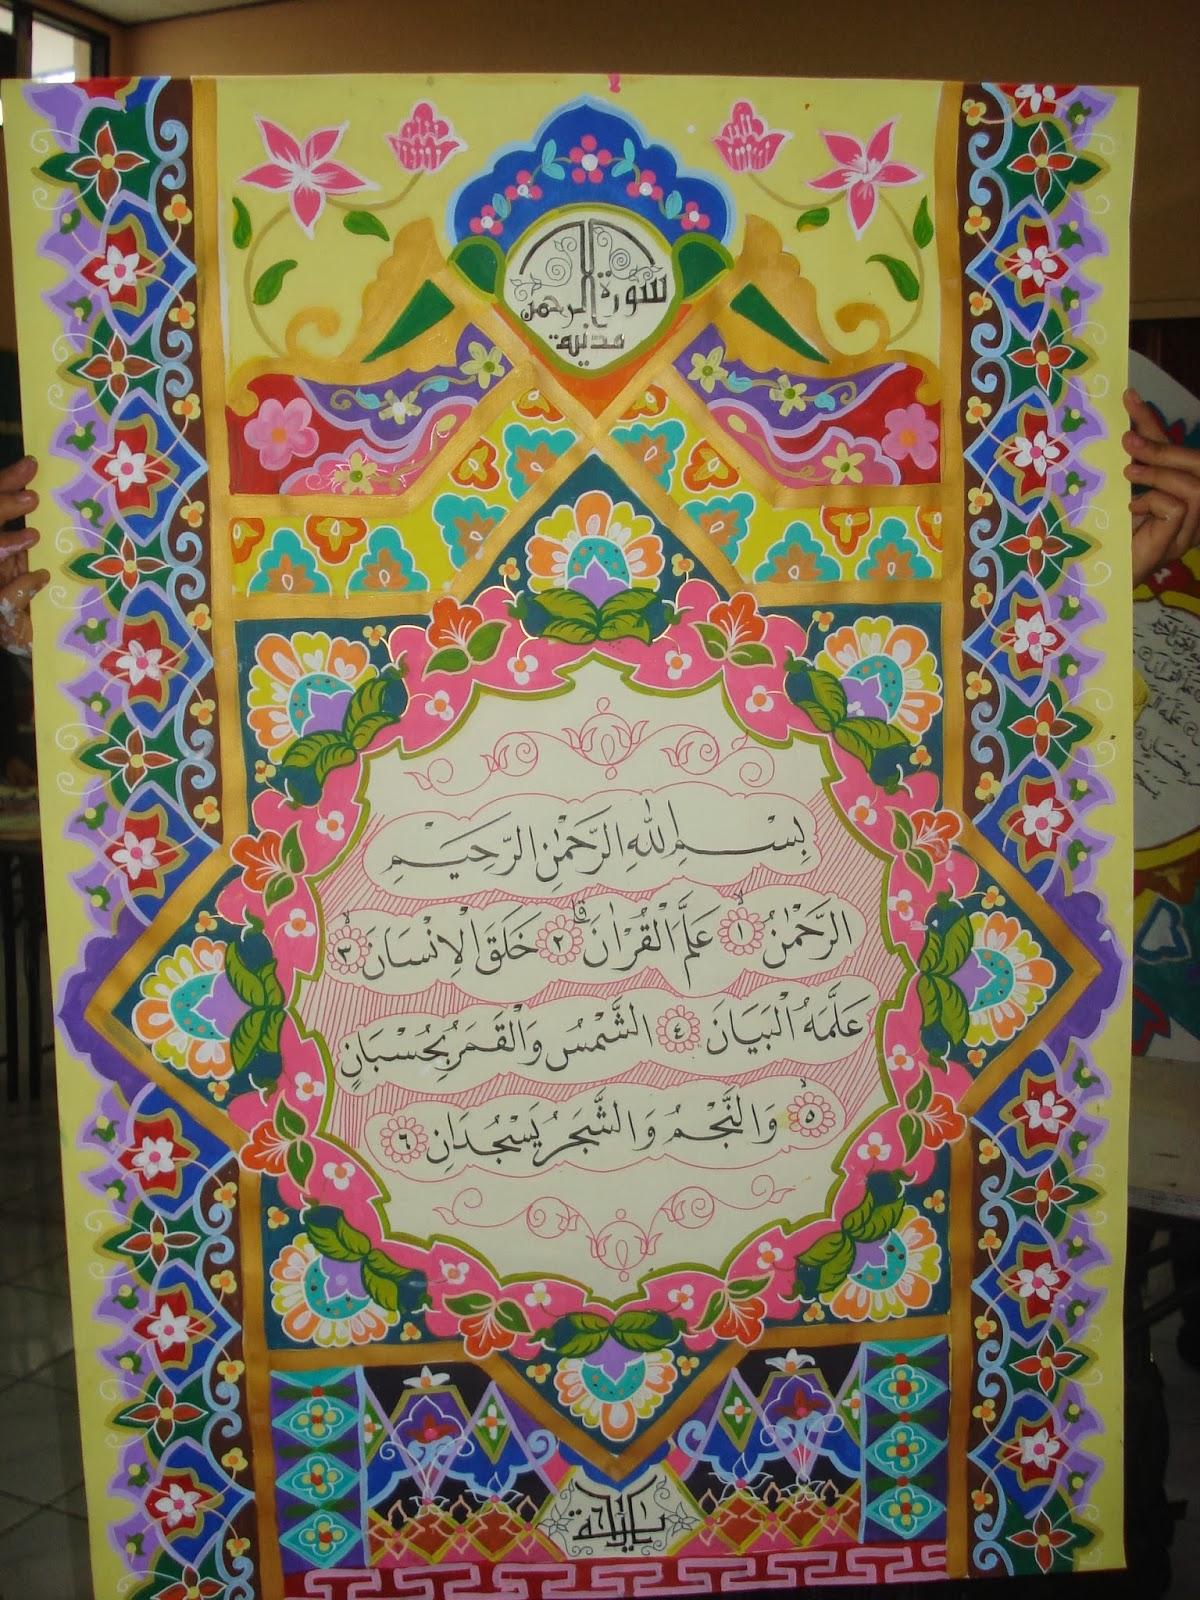 Karya Kaligrafi Hiasan Mushaf Pospenas Page 14 ~ MARAJI'KU.Com